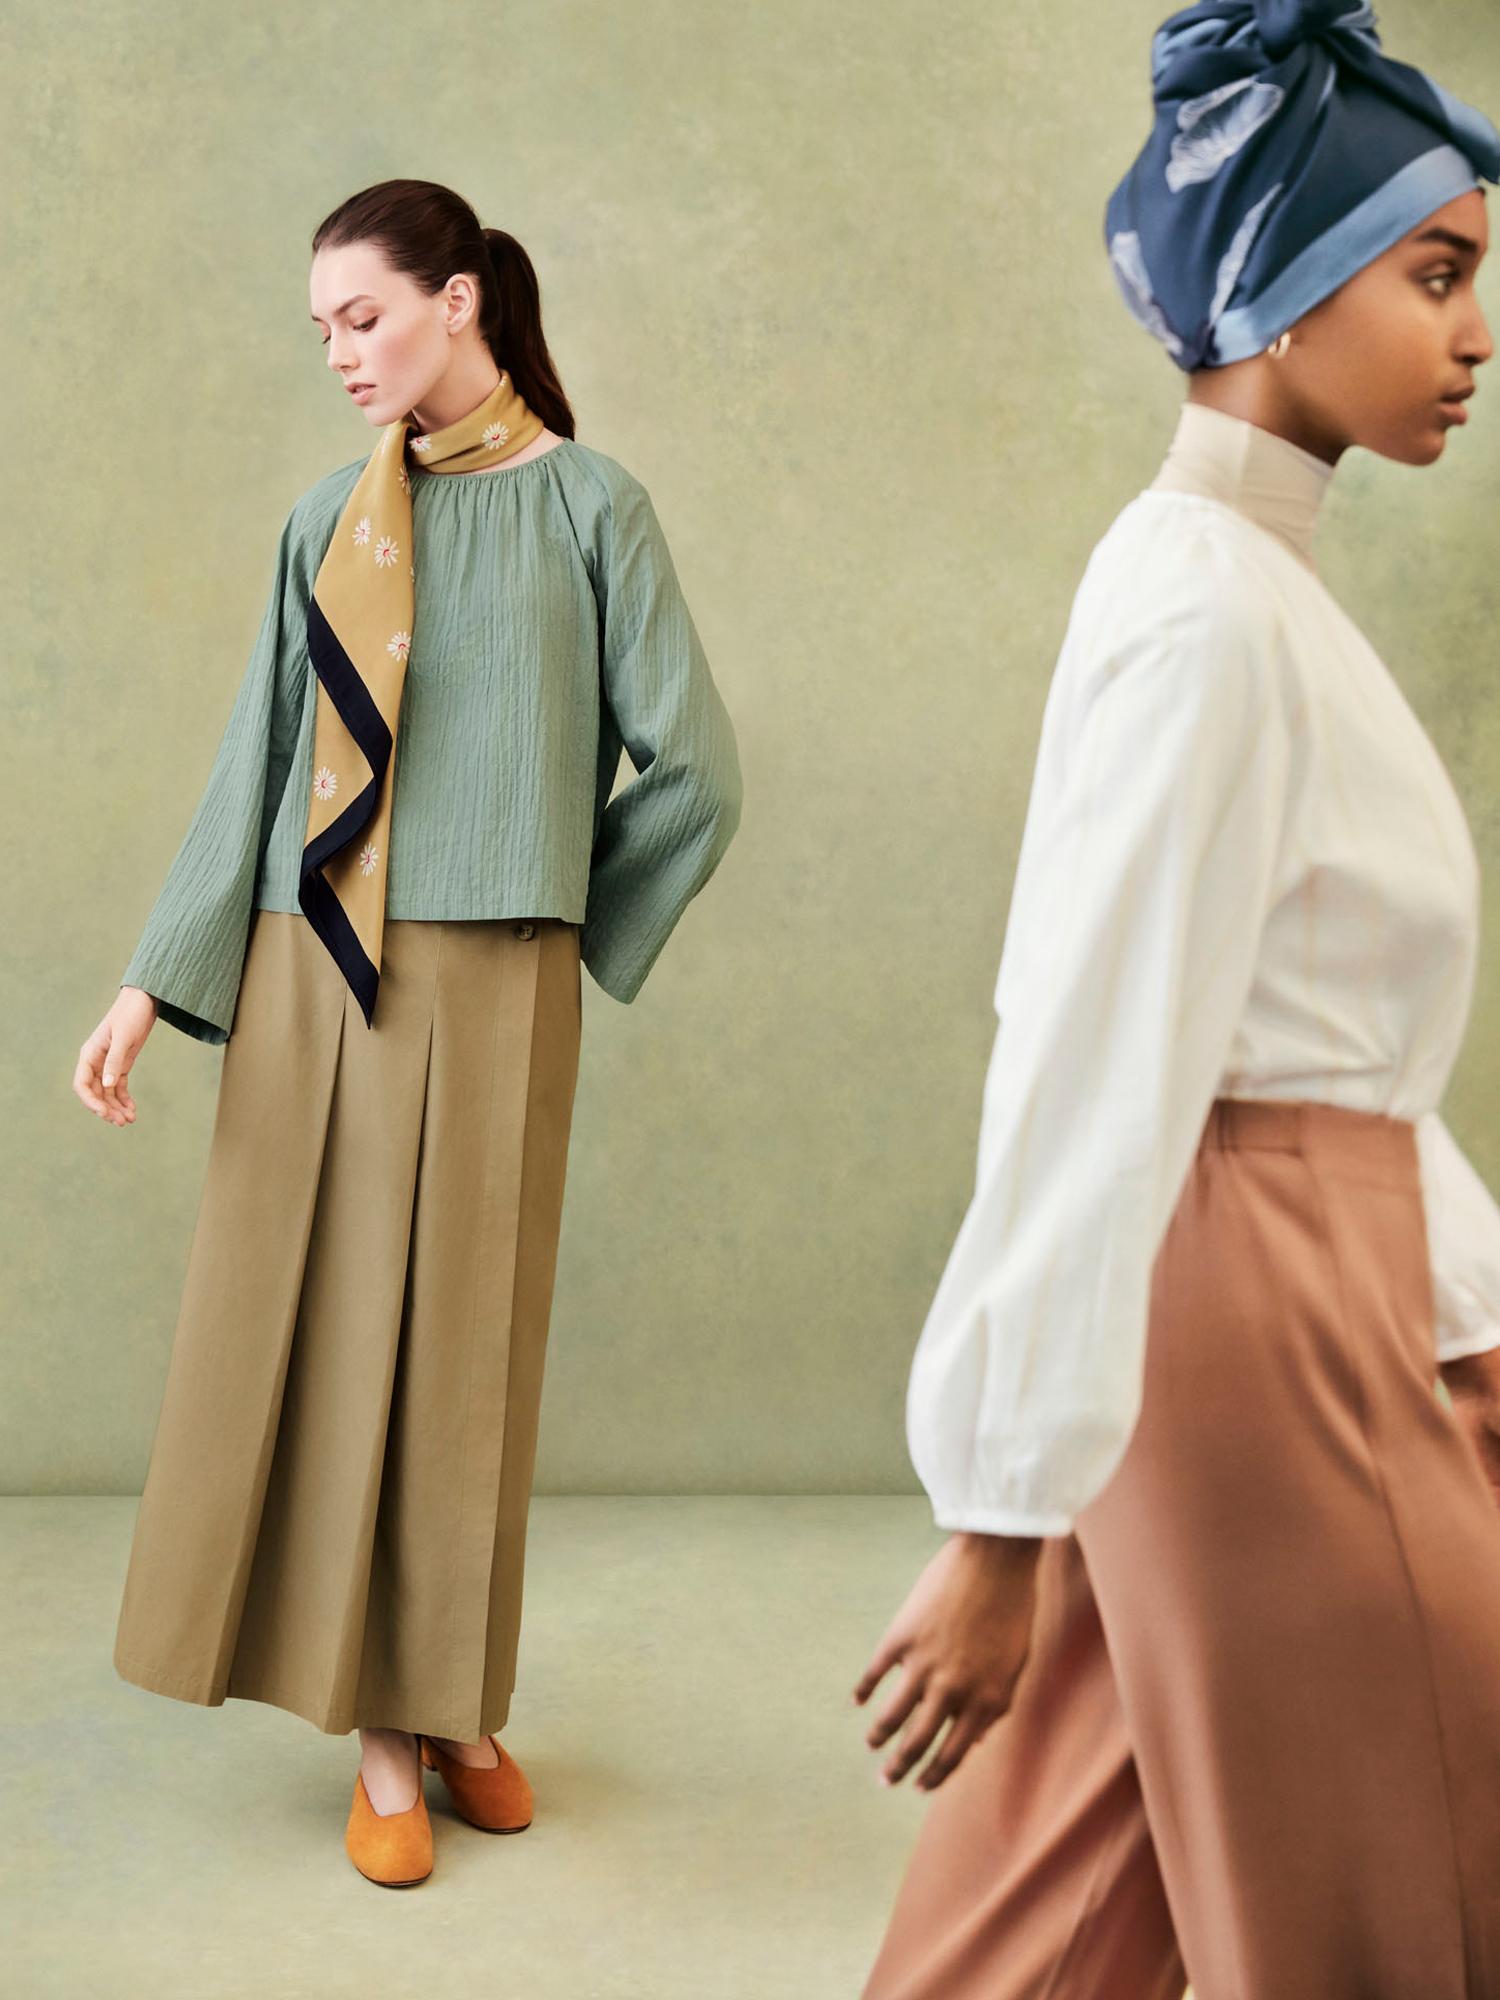 Model on left: W's HPJ Square print stole + W's HPJ Shearing gather L/S blouse + W's HPJ Tuck flare long skirt